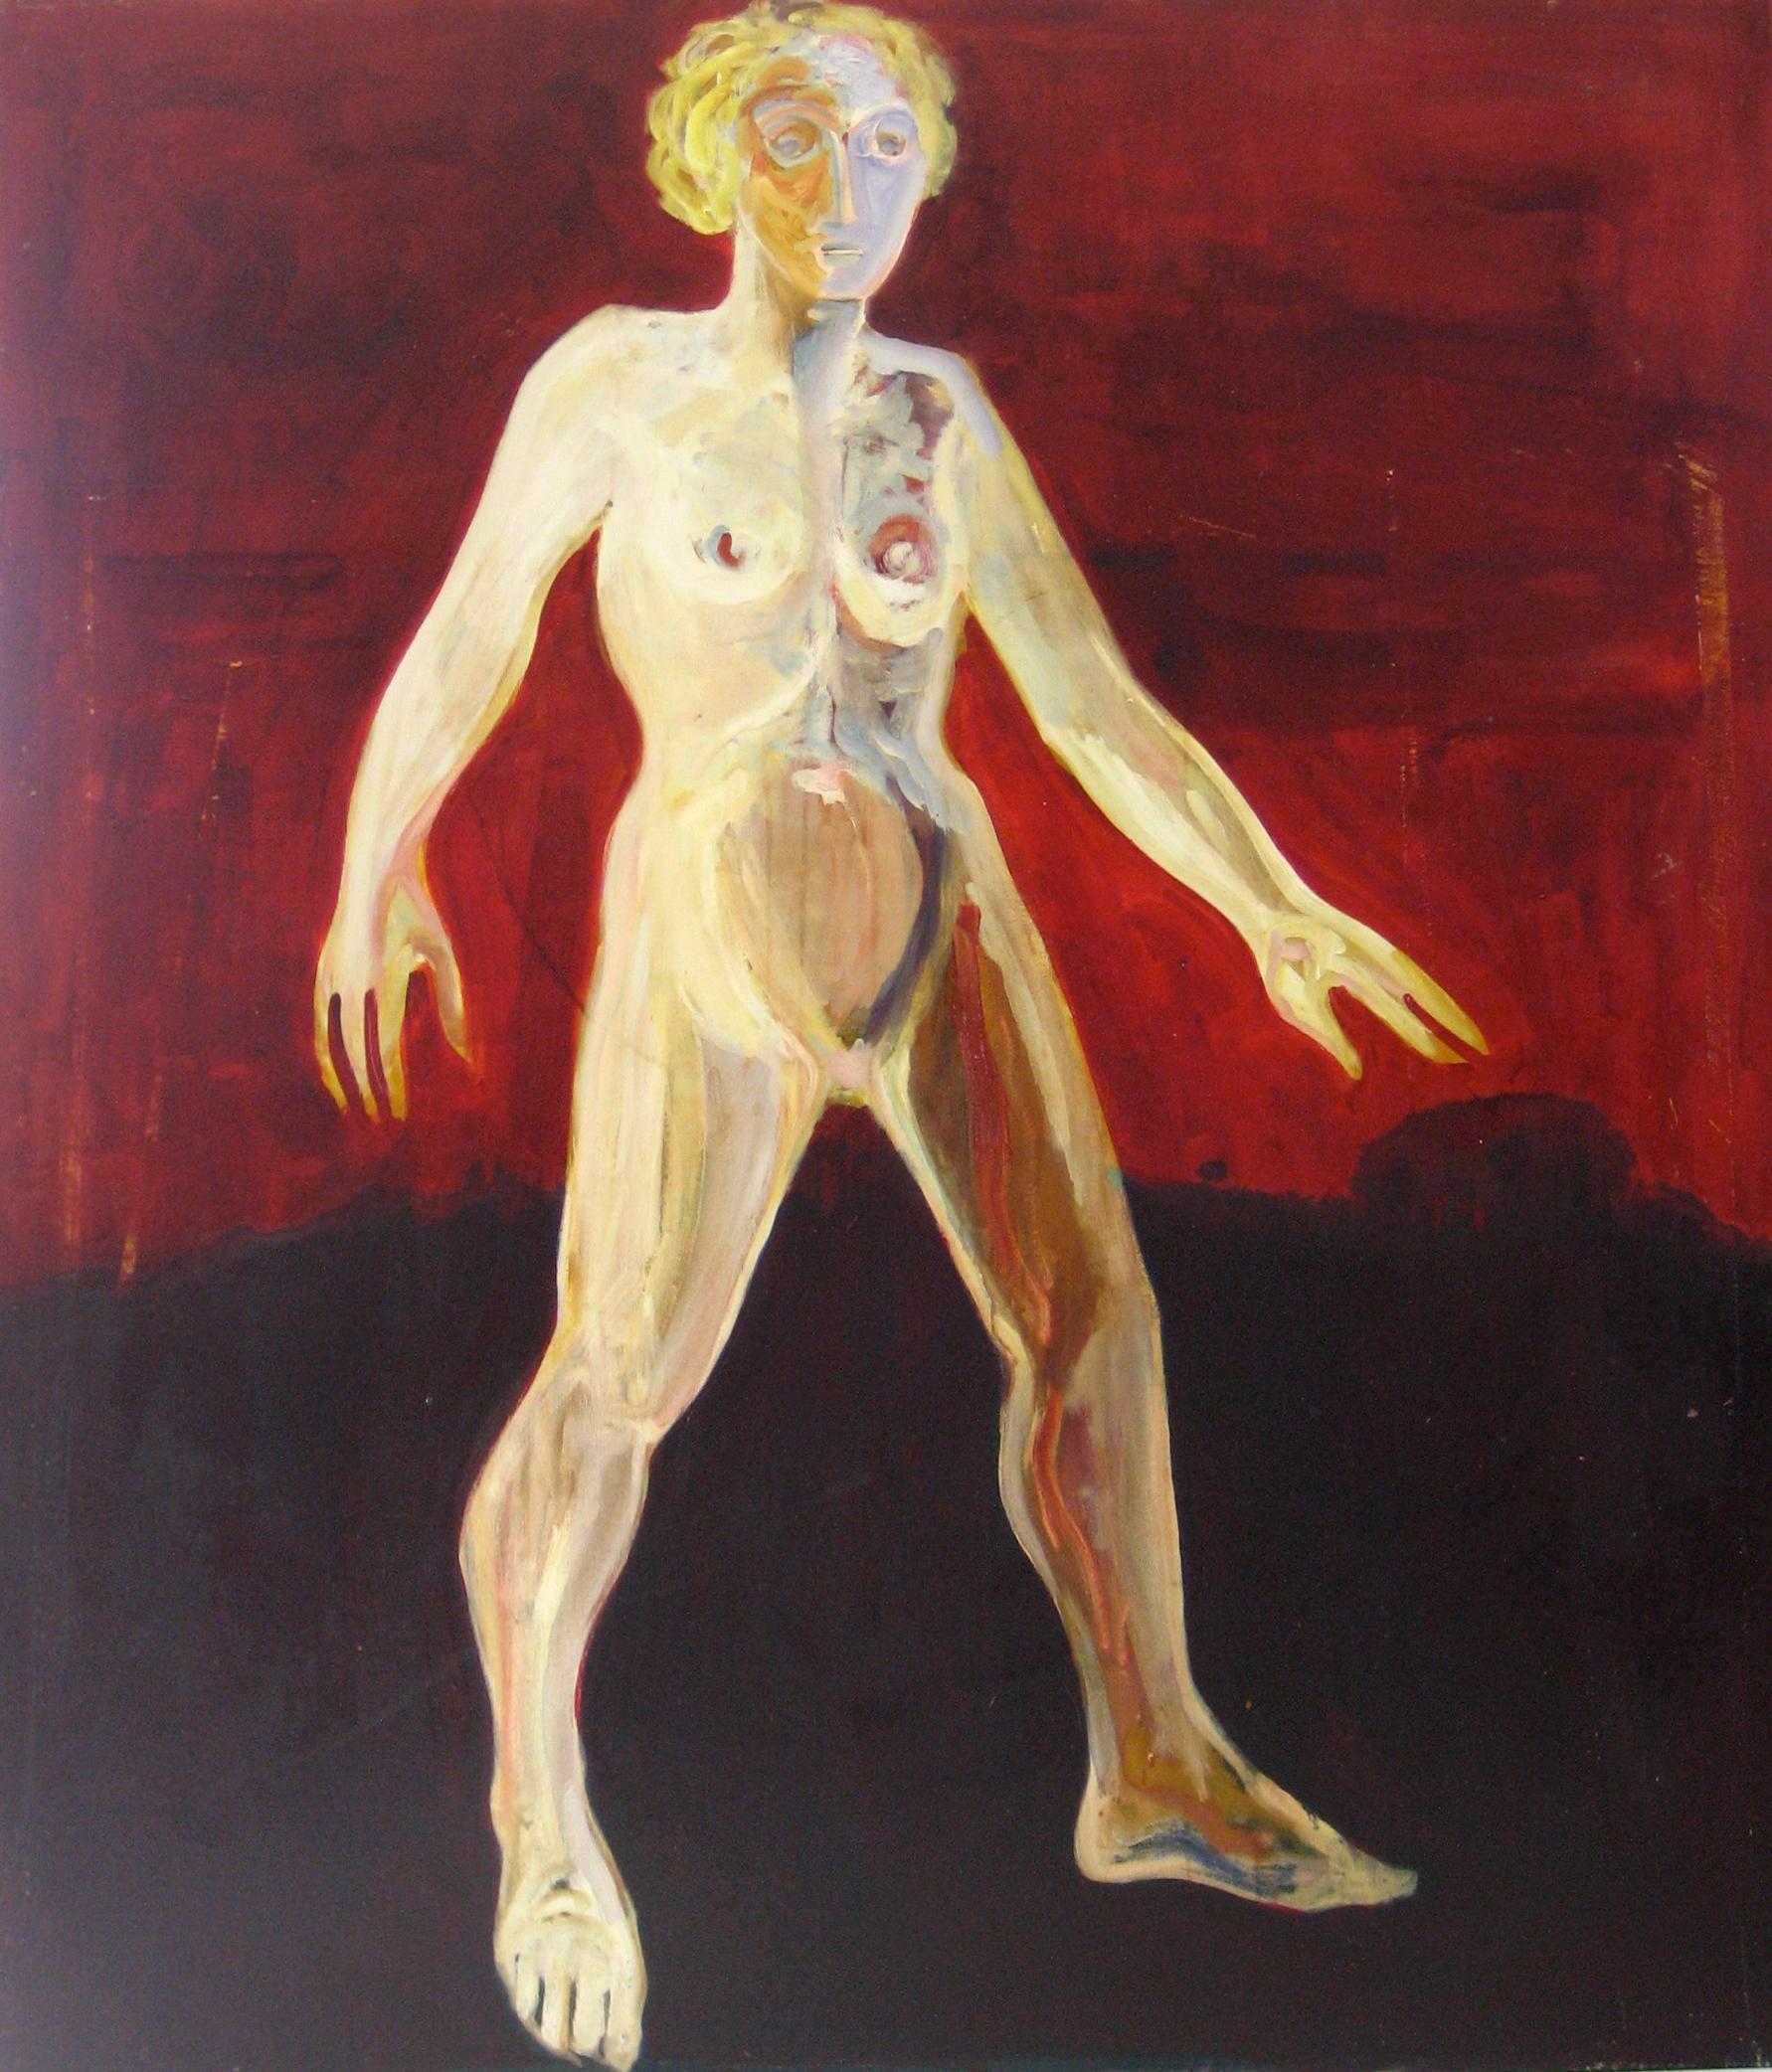 """Barbara S. Poet"" Bay Area Figurative Portrait in Oil, 1978"